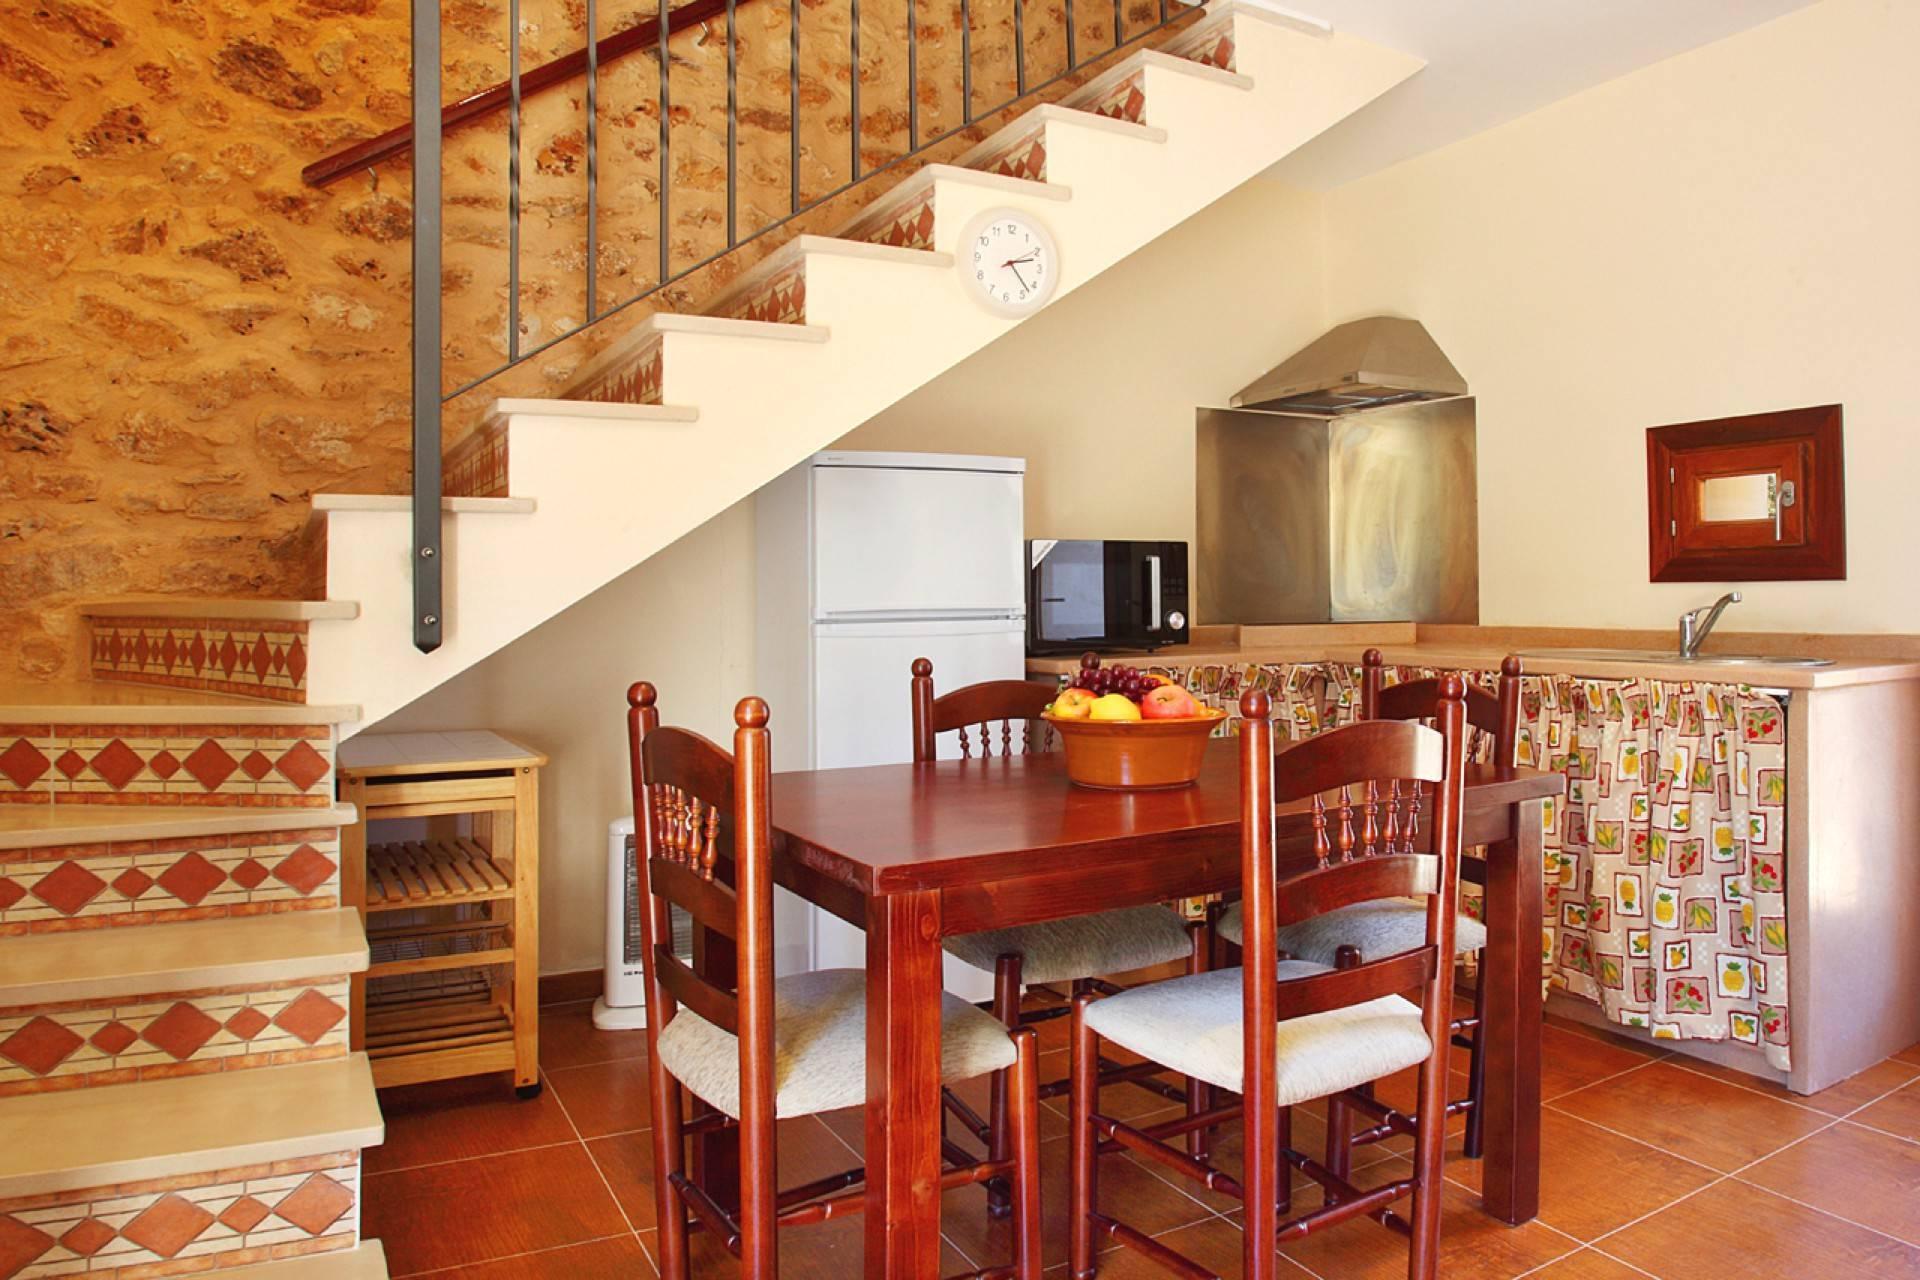 01-142 Rustic farmhouse Mallorca east Bild 21